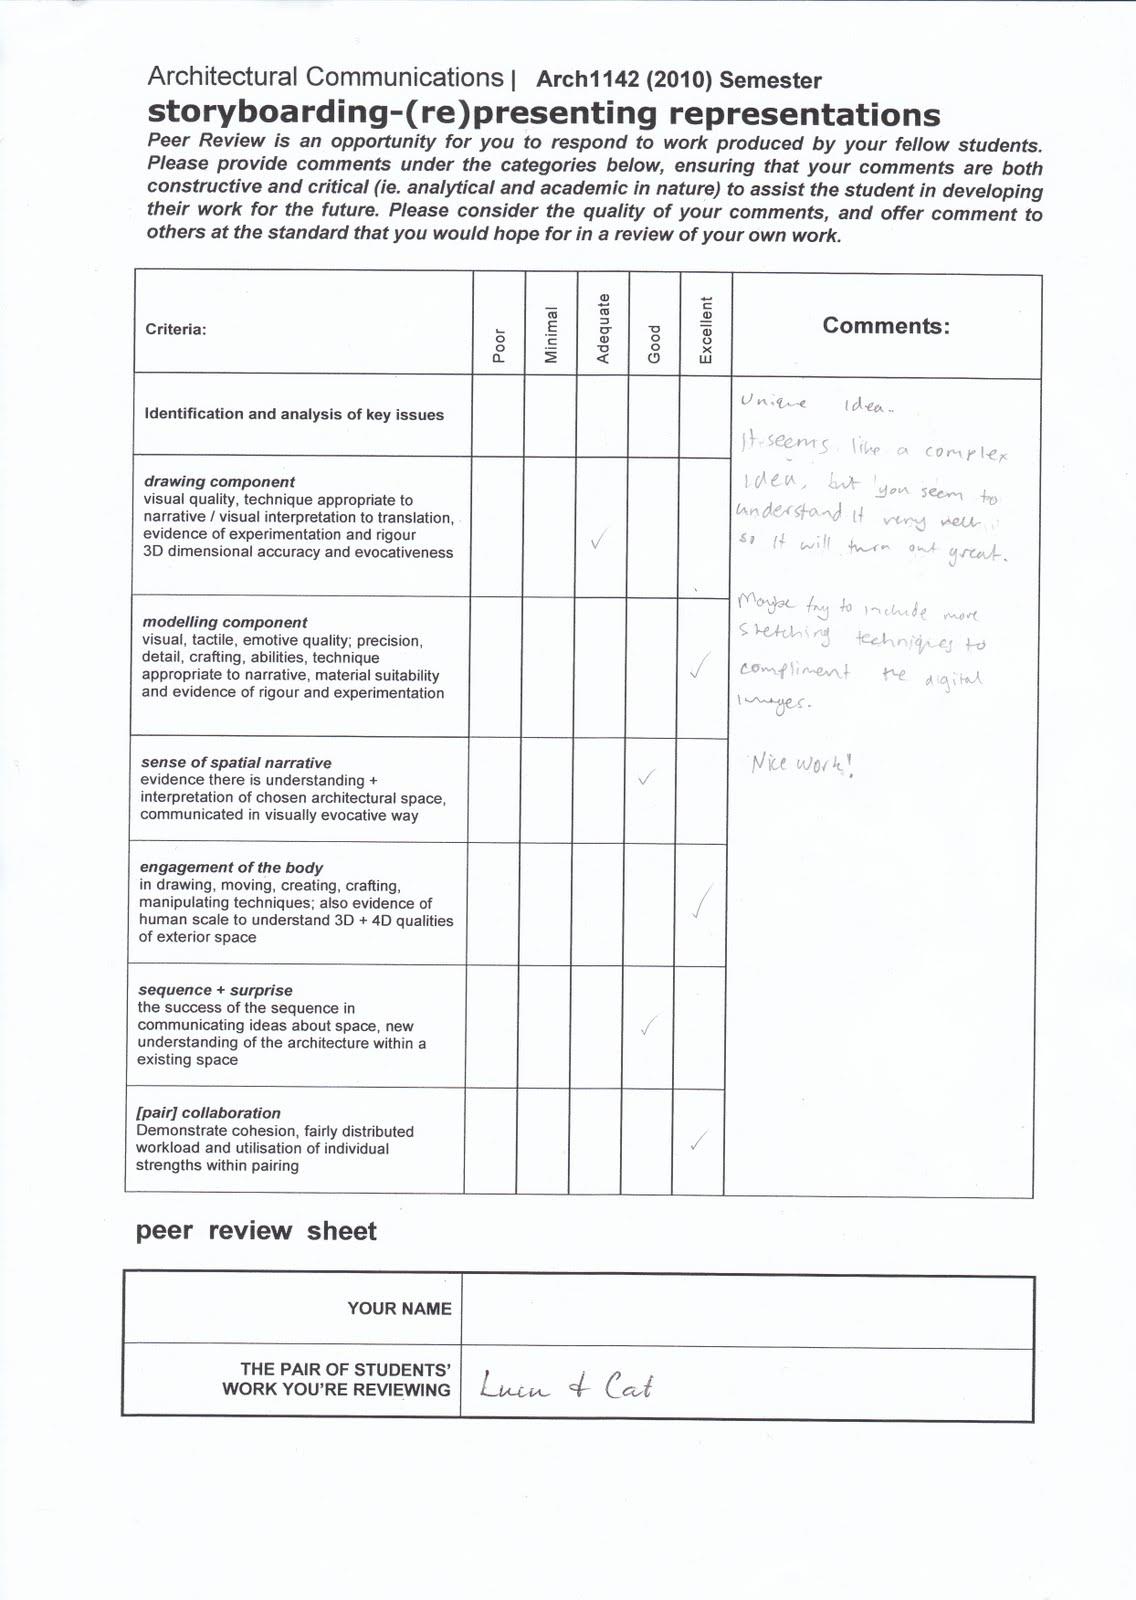 Luen Samonte Arch Week 2 Storyboard And Progress Feedback Sheet